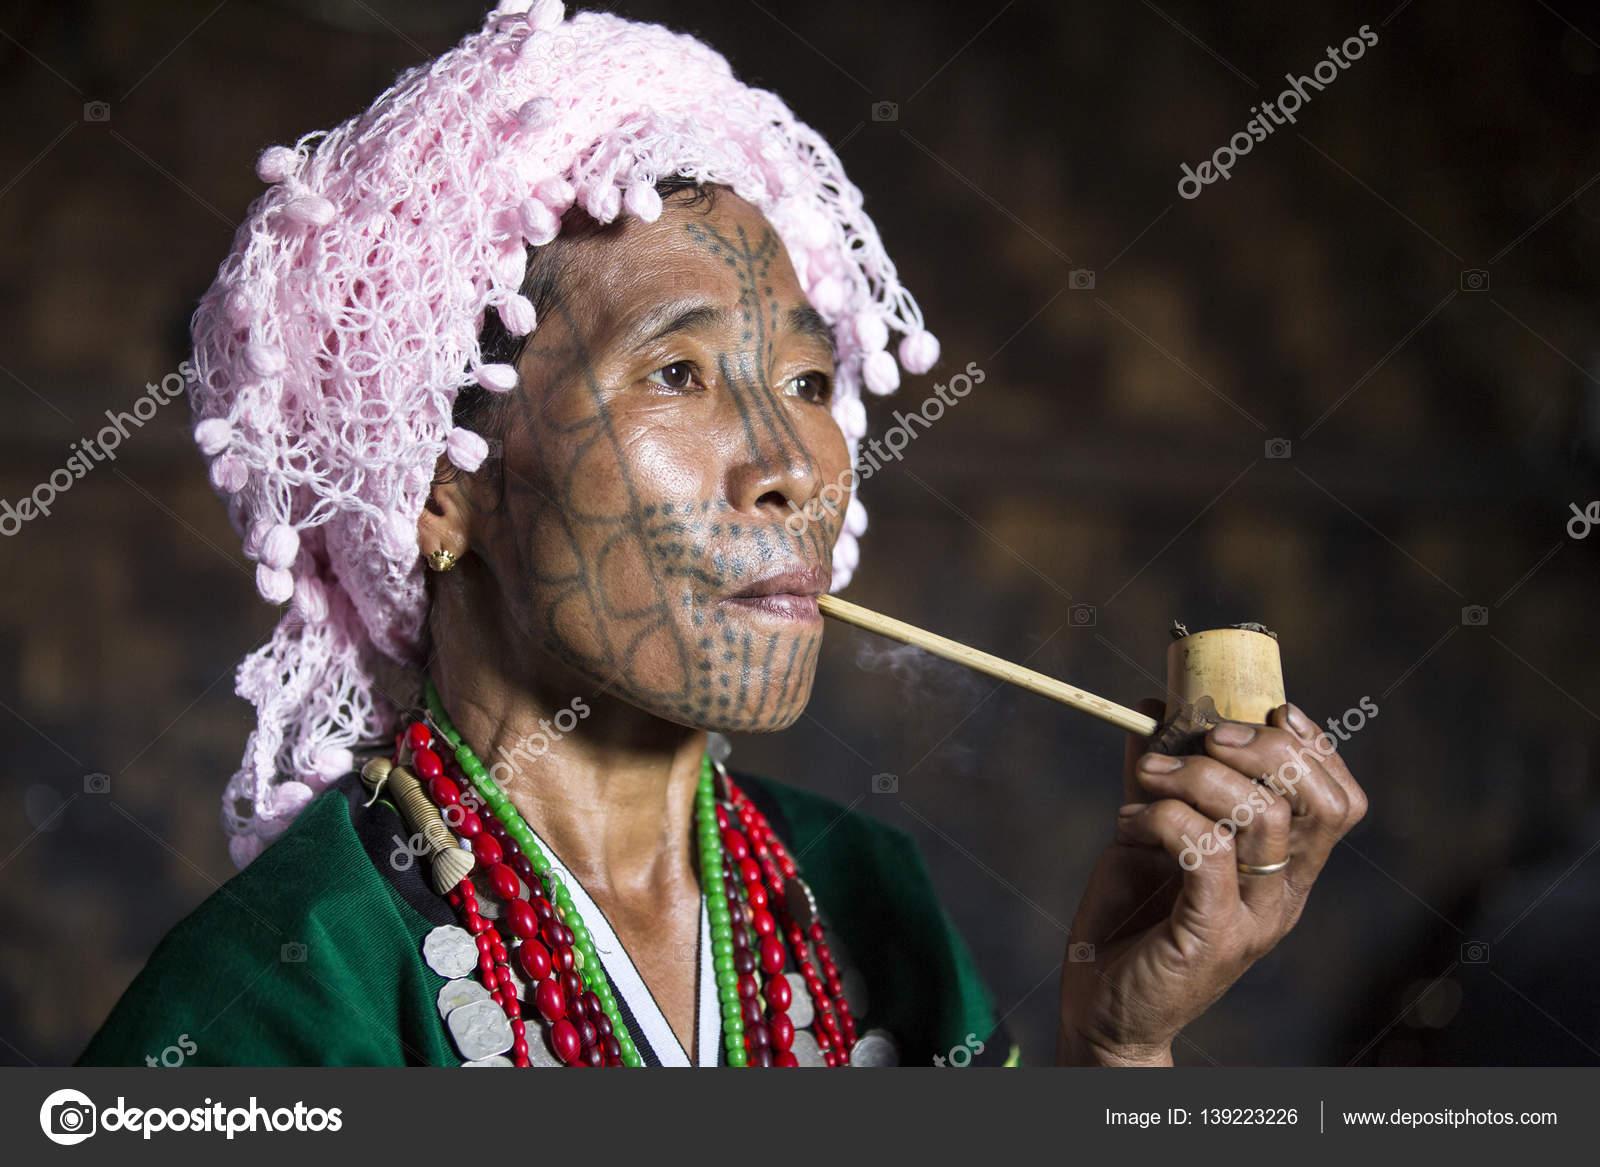 maison femme pipes